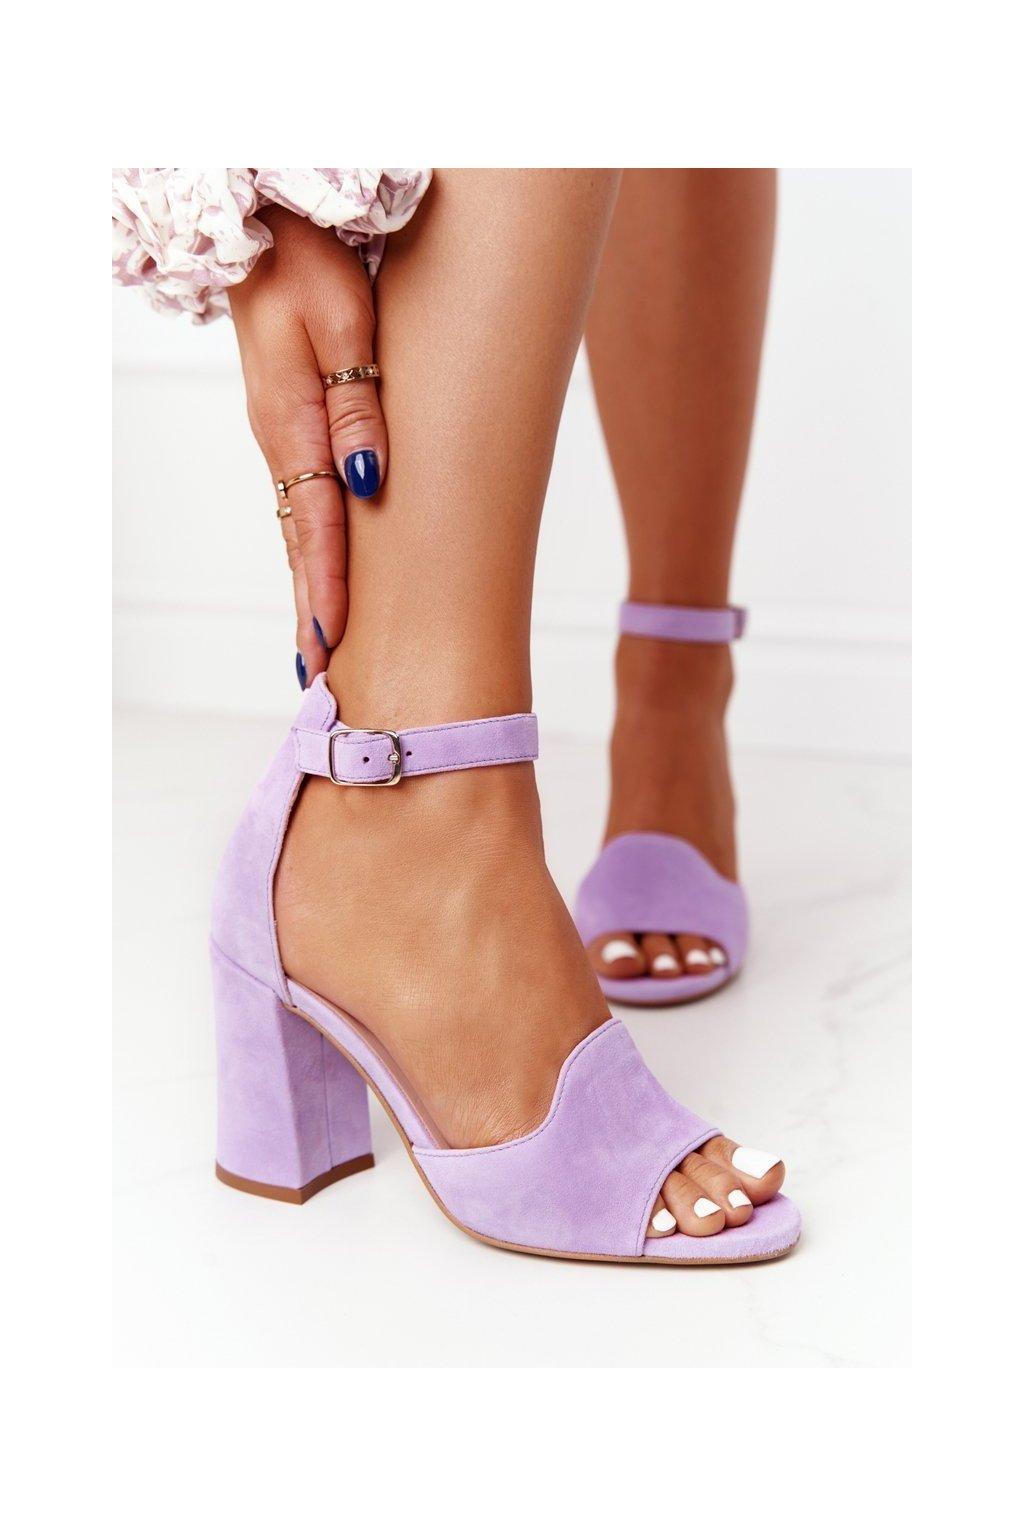 Dámske sandále na podpätku farba fialová kód obuvi 4361537/477 MALVA / FIOLET